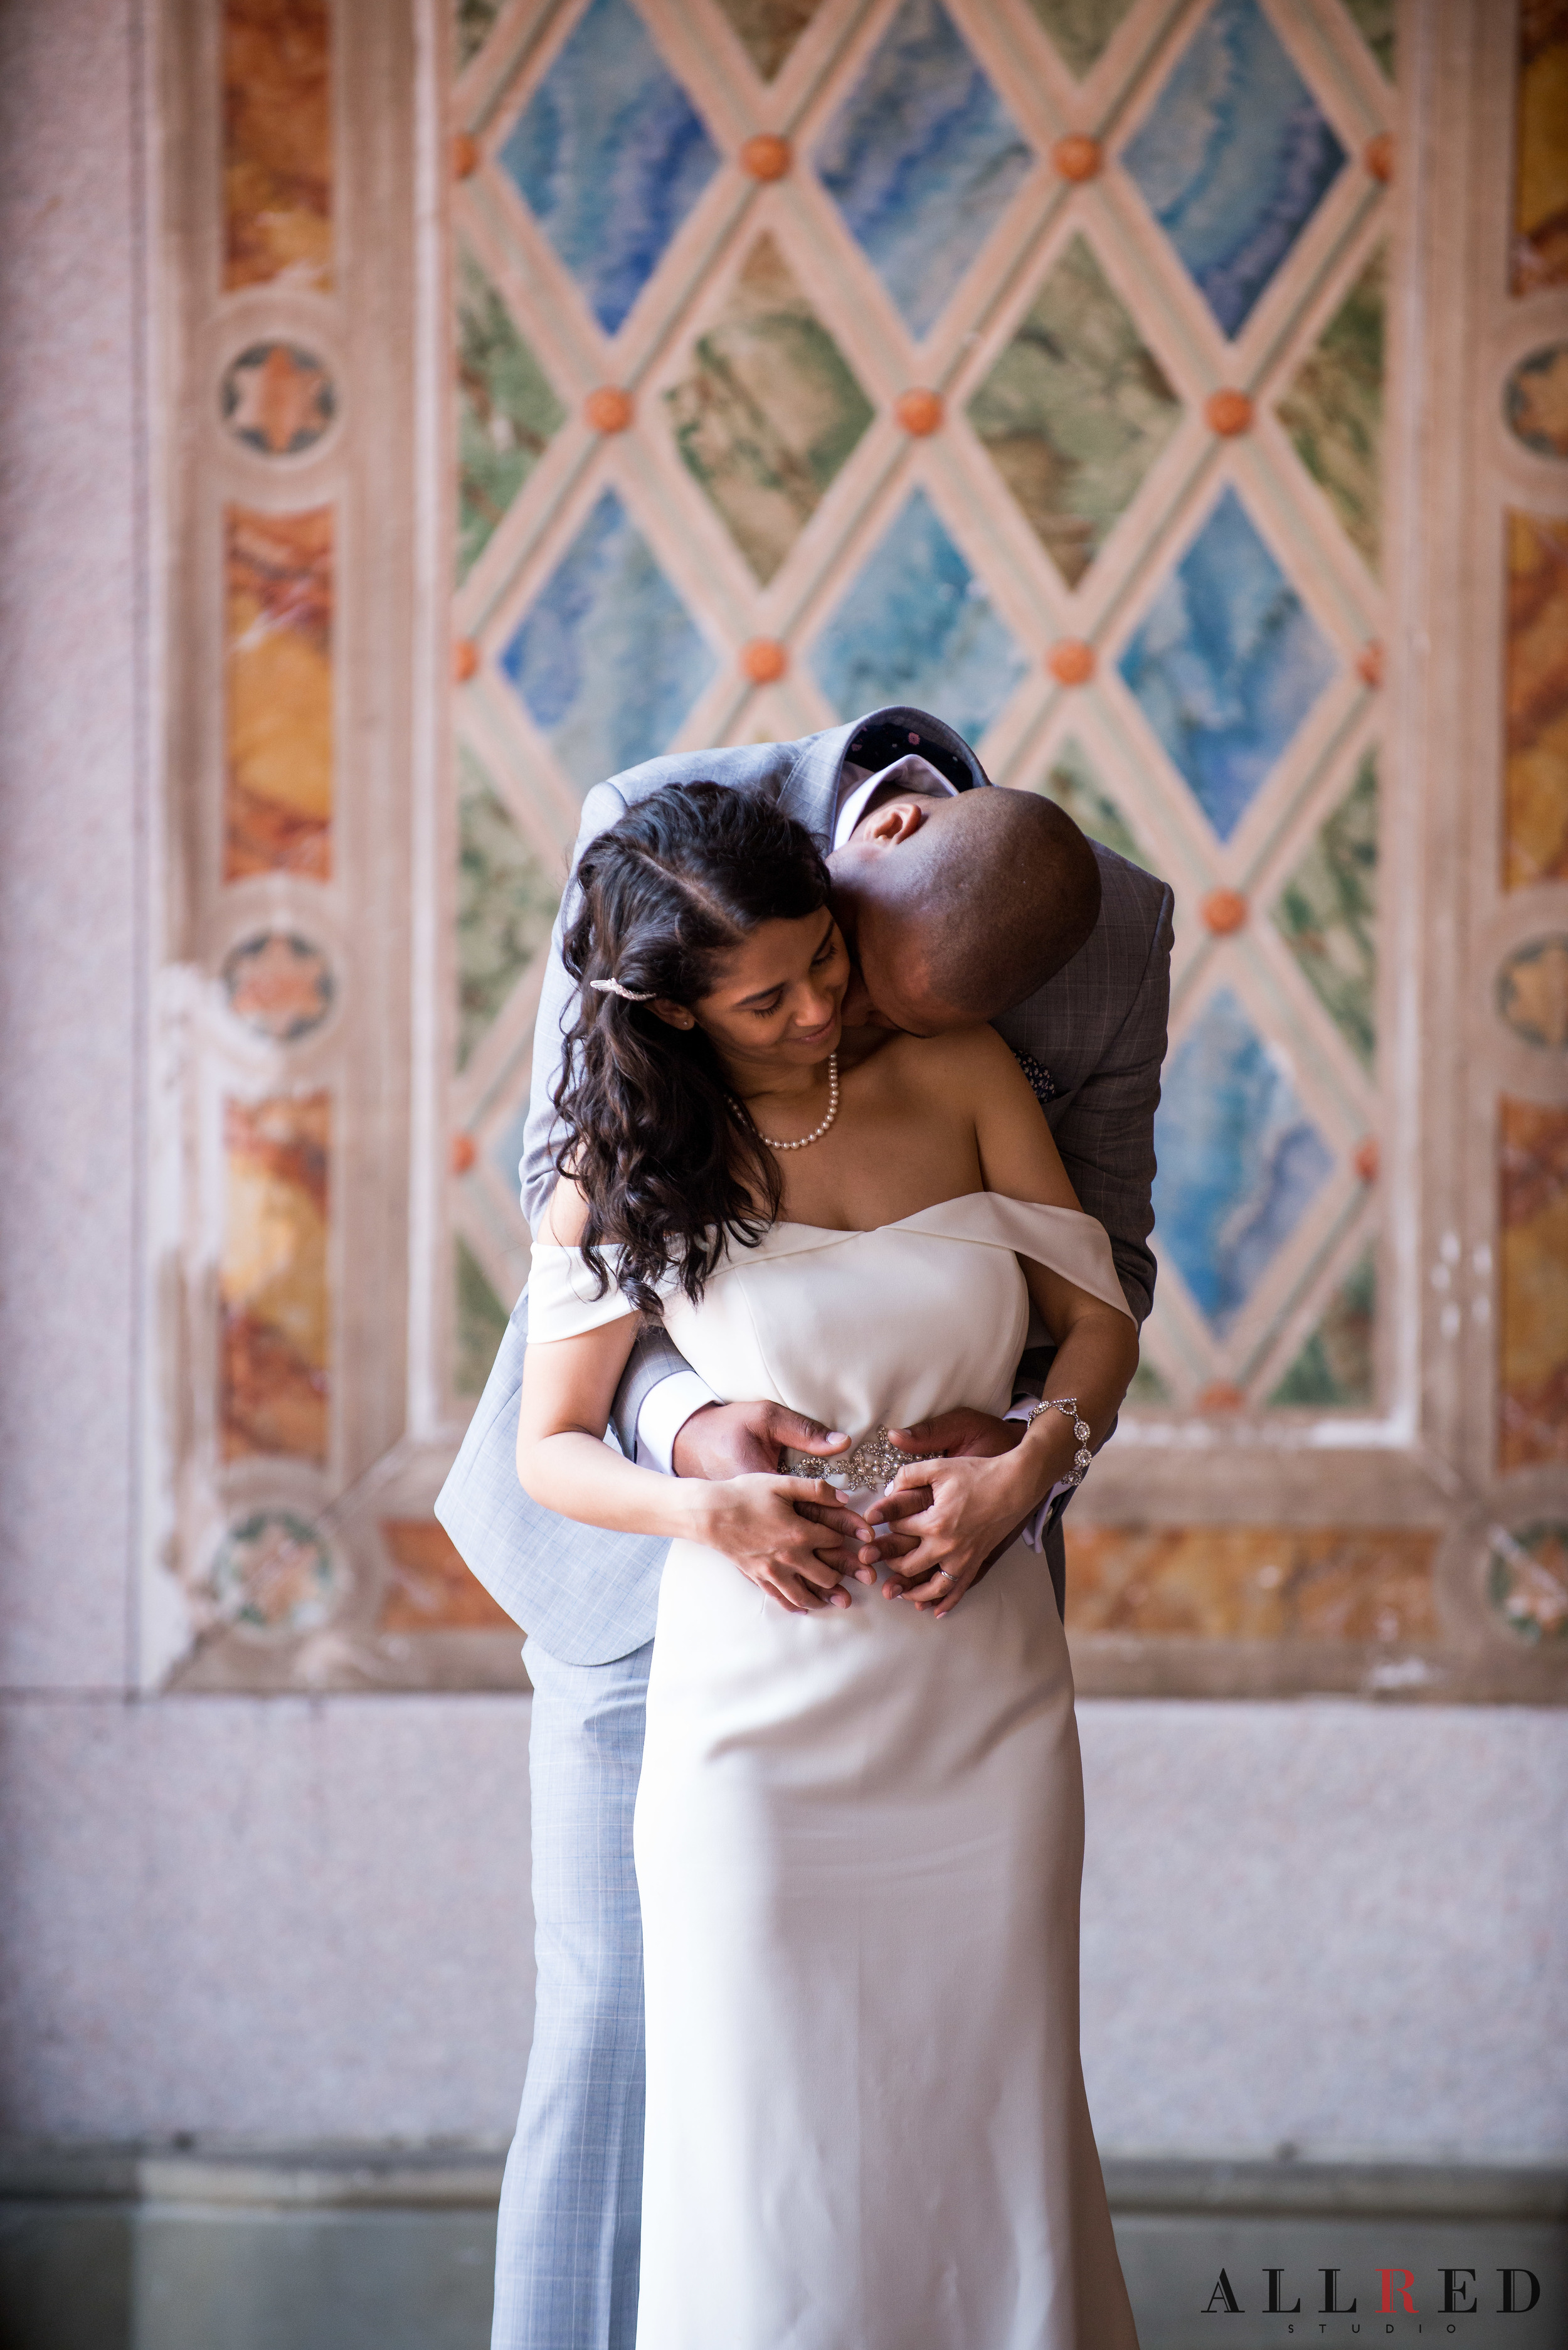 Wedding-central-park-allred-studio-new-york-photographer-new-jersey-hudson-valley-2622.jpg